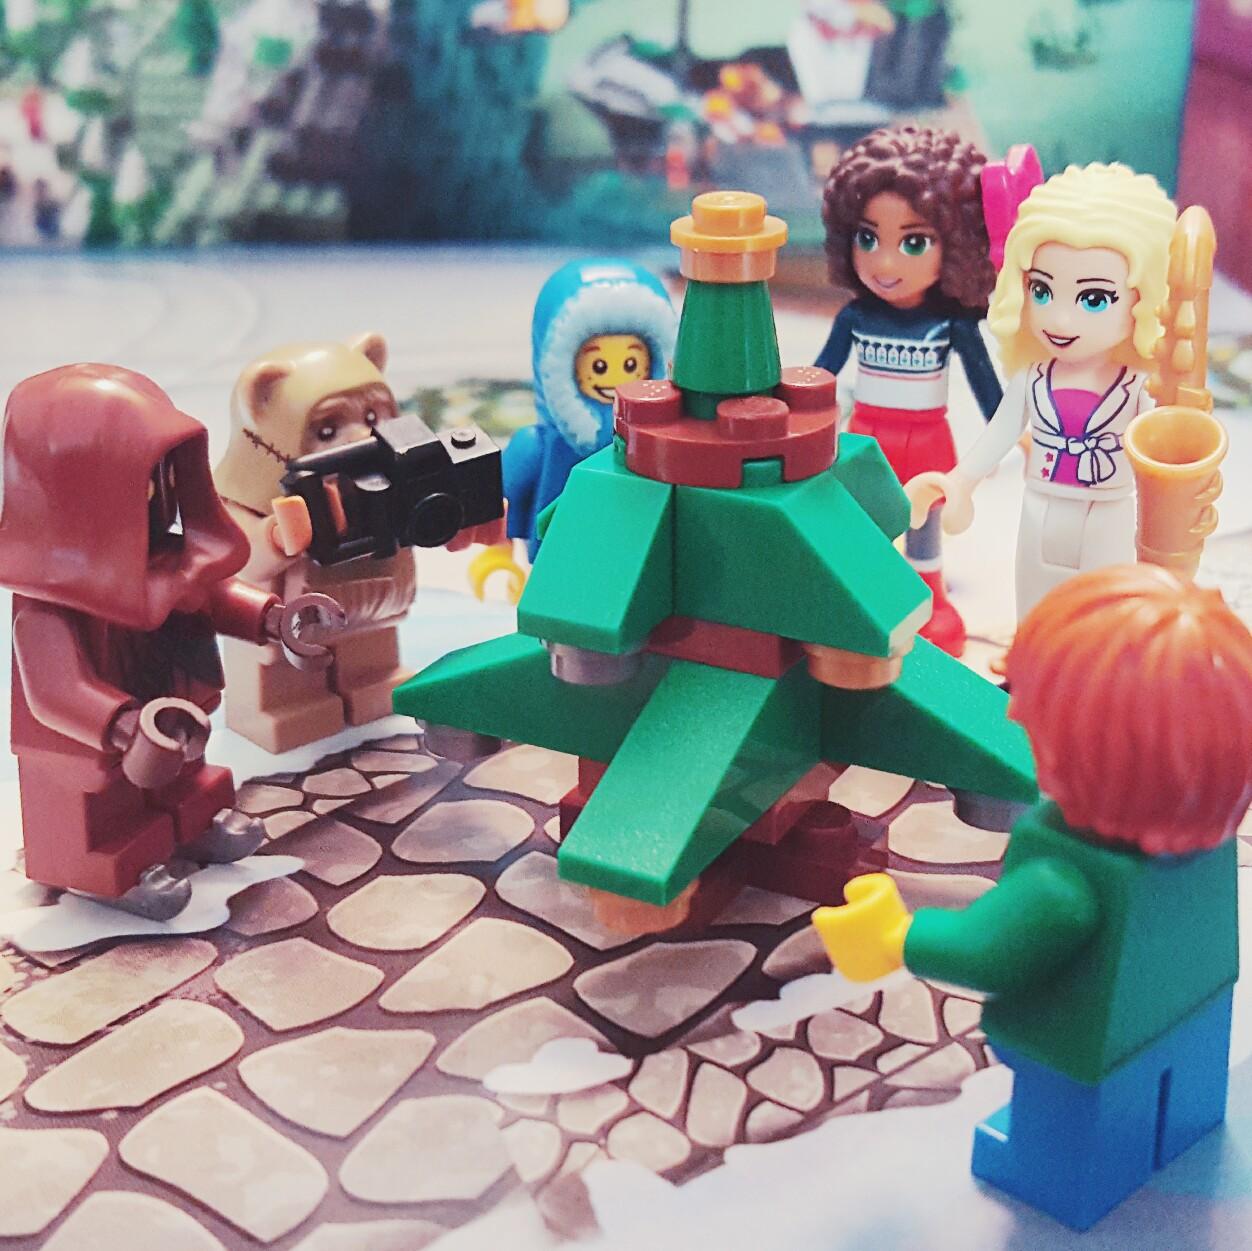 """Oh Christmas Tree, Oh Christmas Tree..."" - Day 10 of LEGO City Advent Calendar"